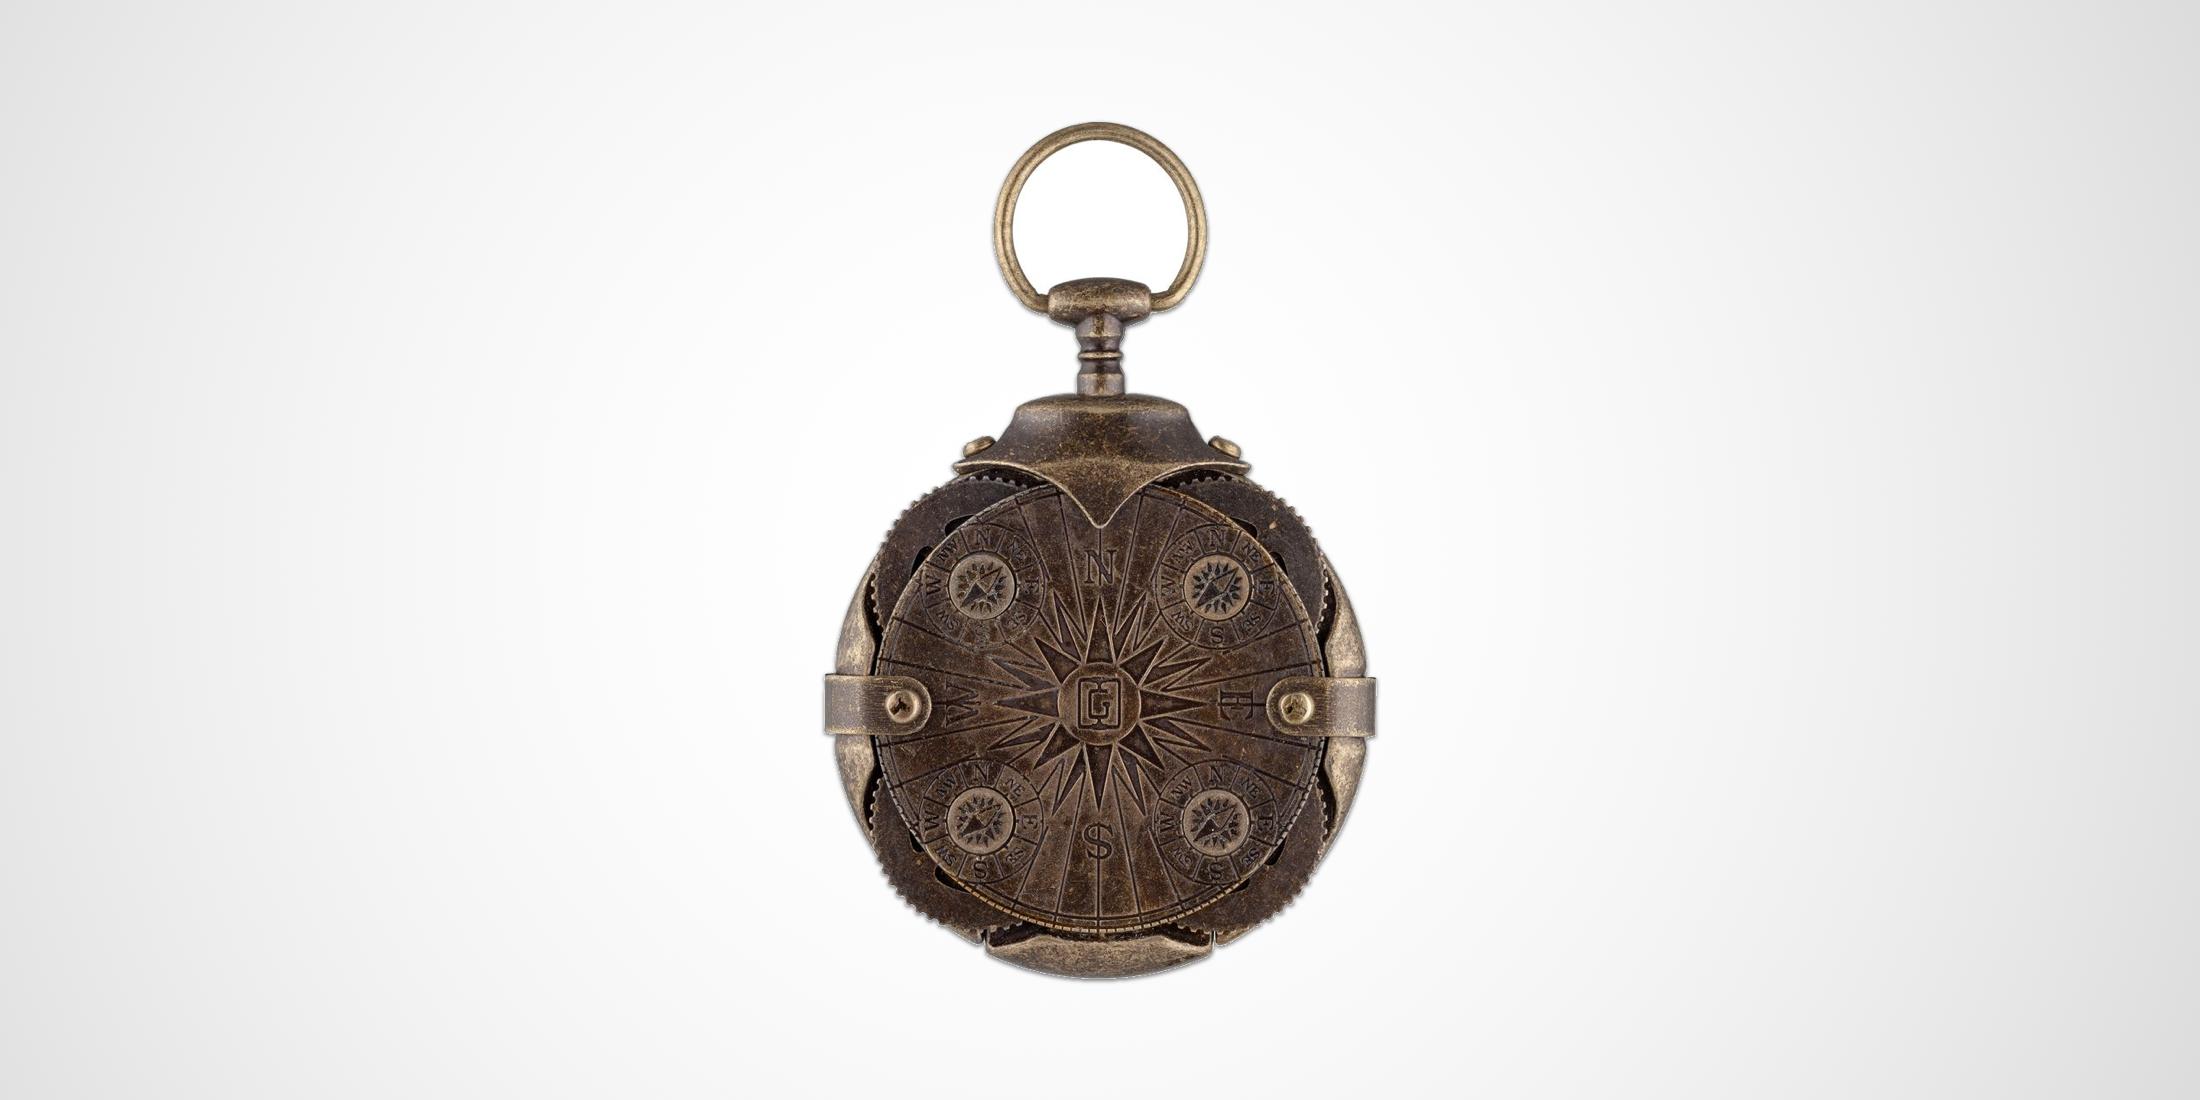 Locking Compass Flash Drive